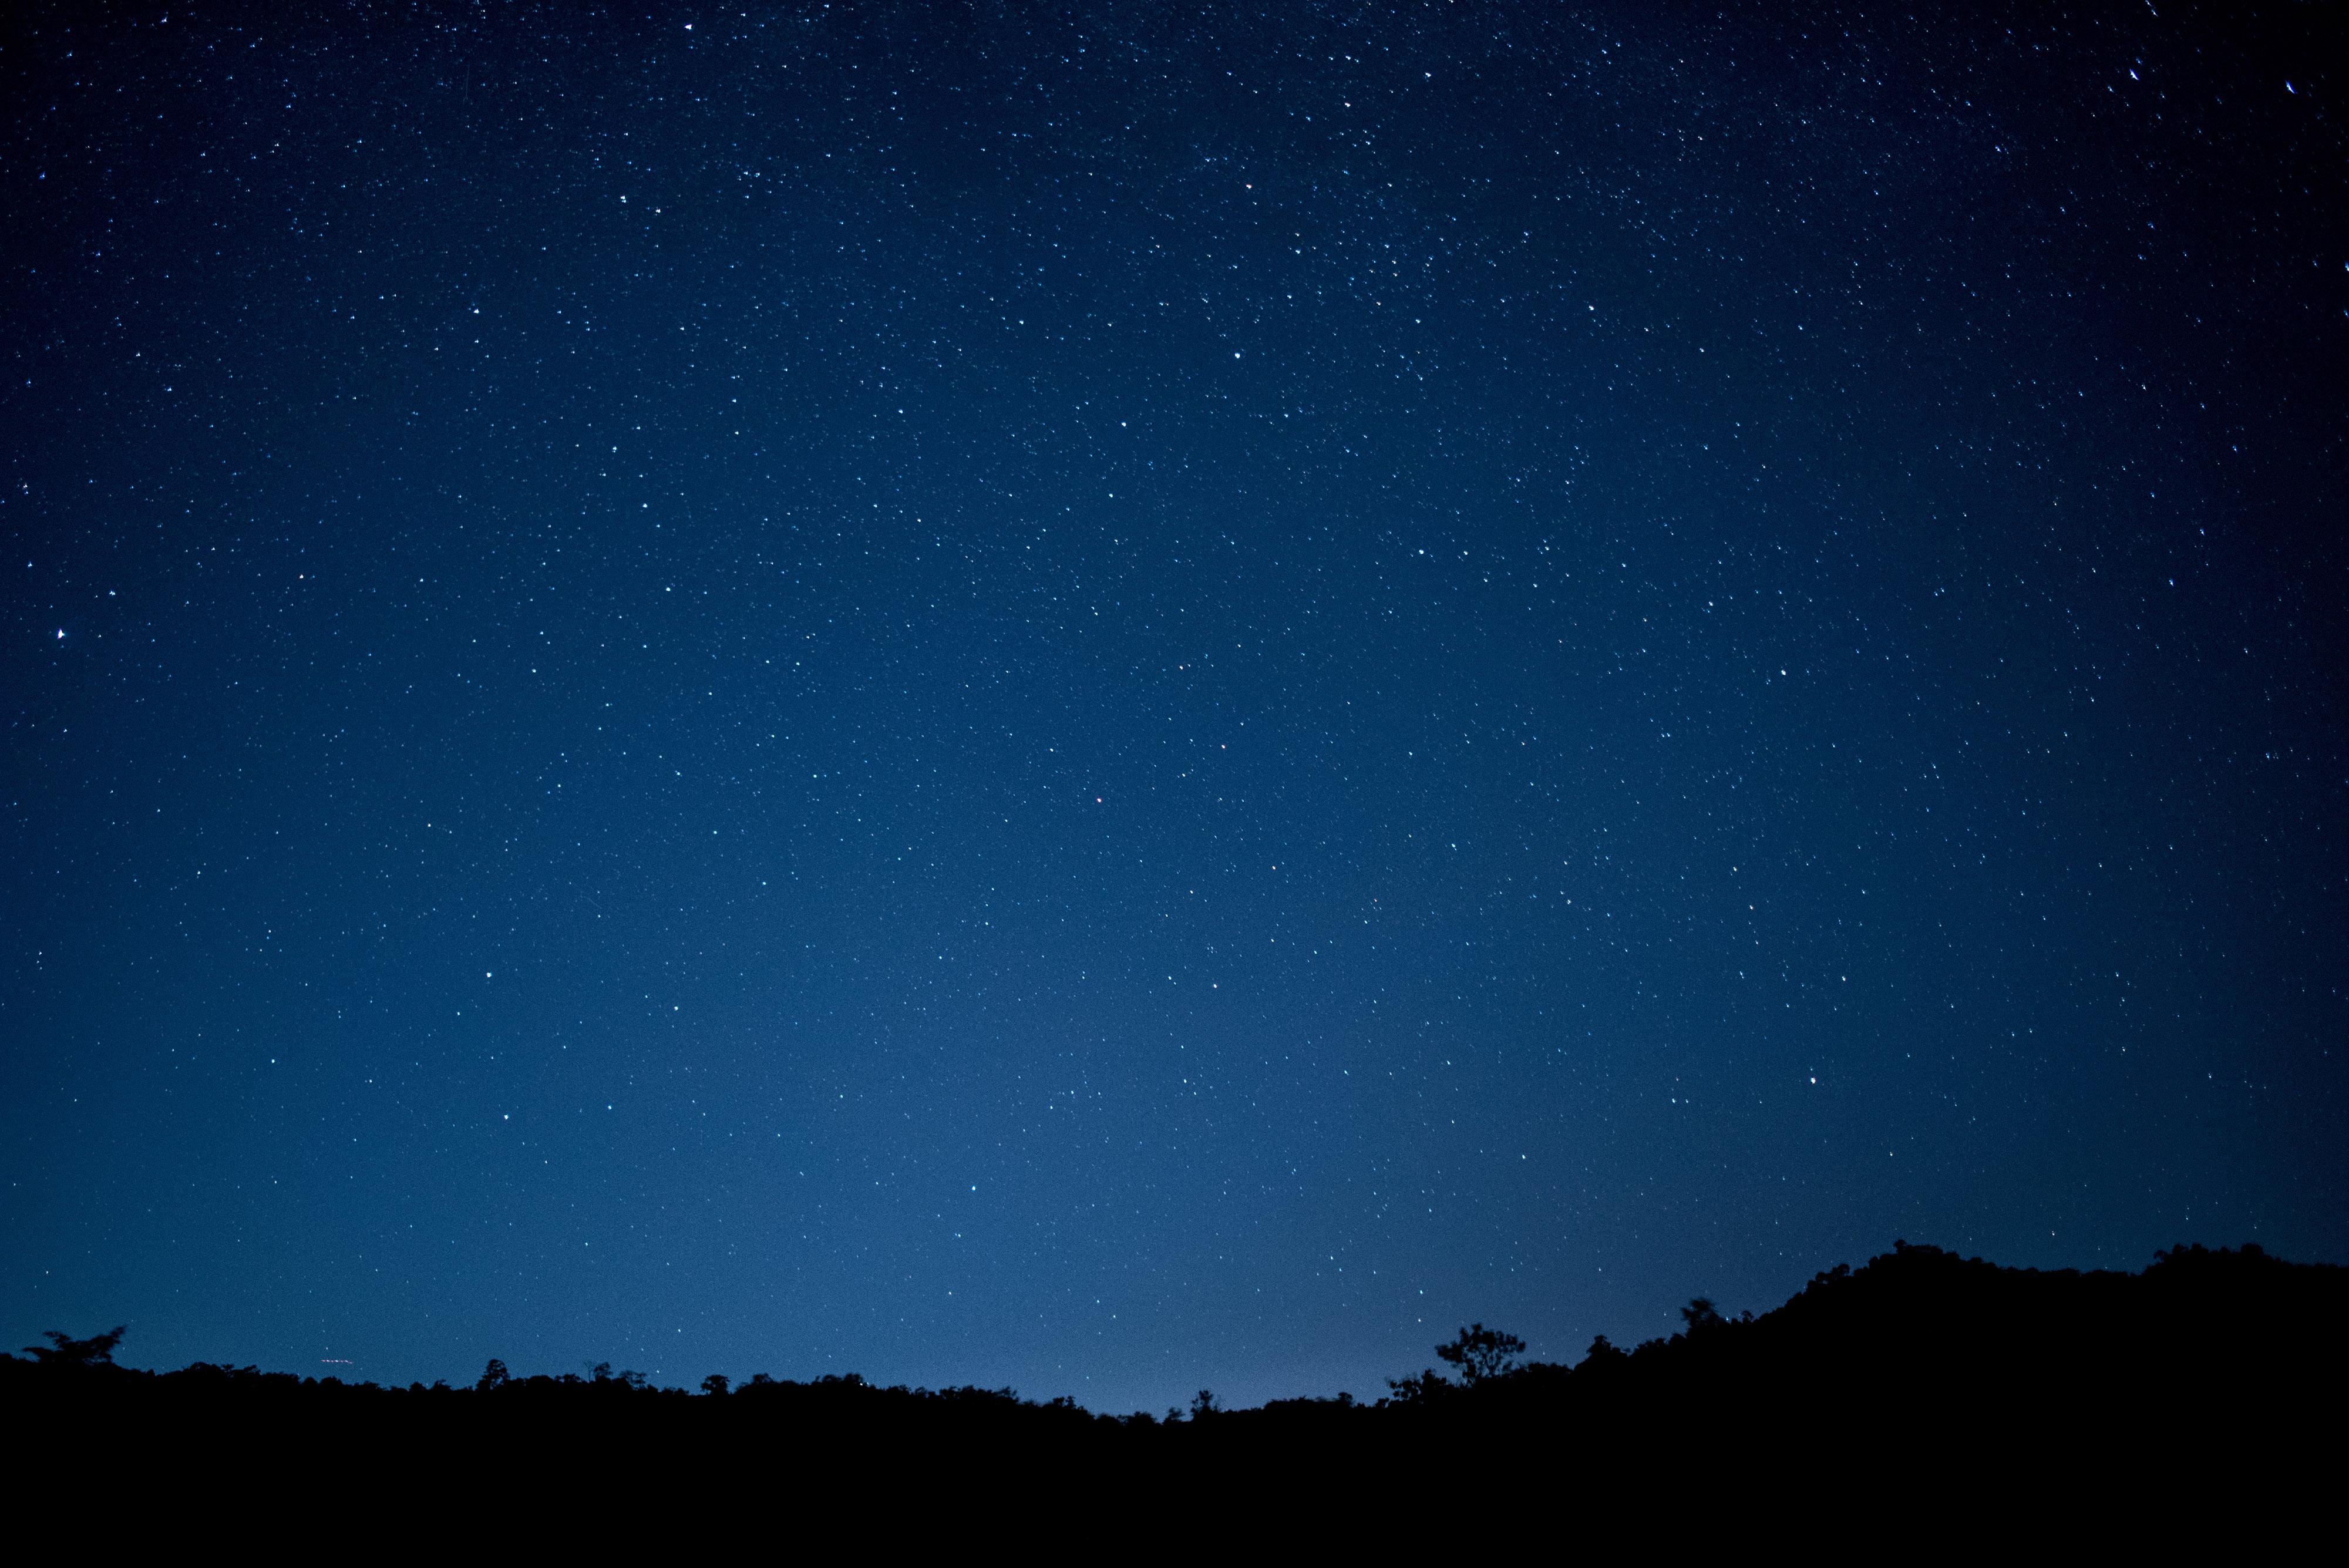 sky stars night background-edited